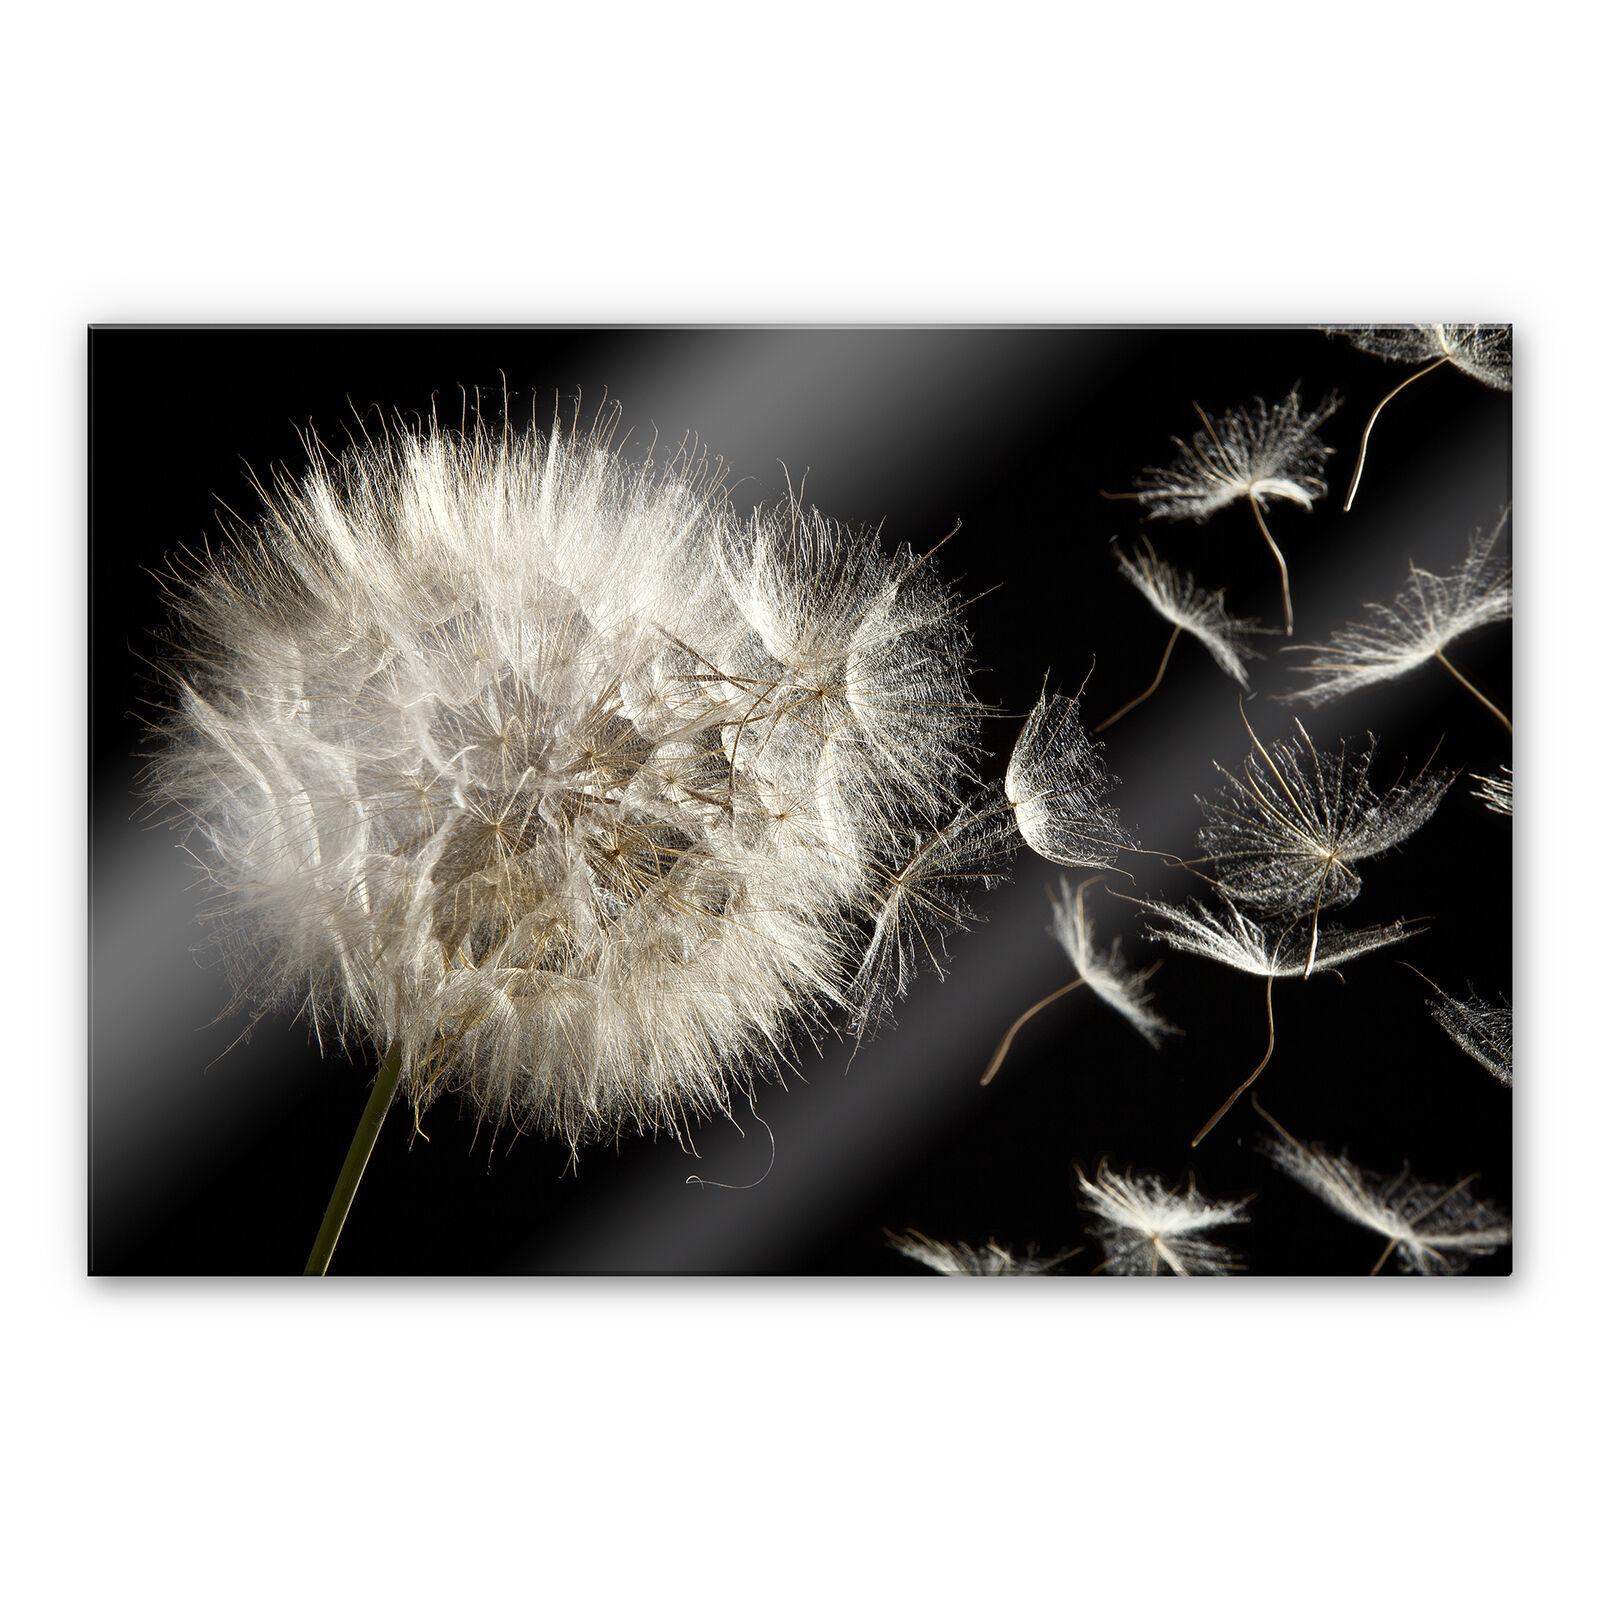 Acrylglas XXL Wandbild PusteBlaume schwarz weiß BILD hohe Farbechtheit WANDDEKO